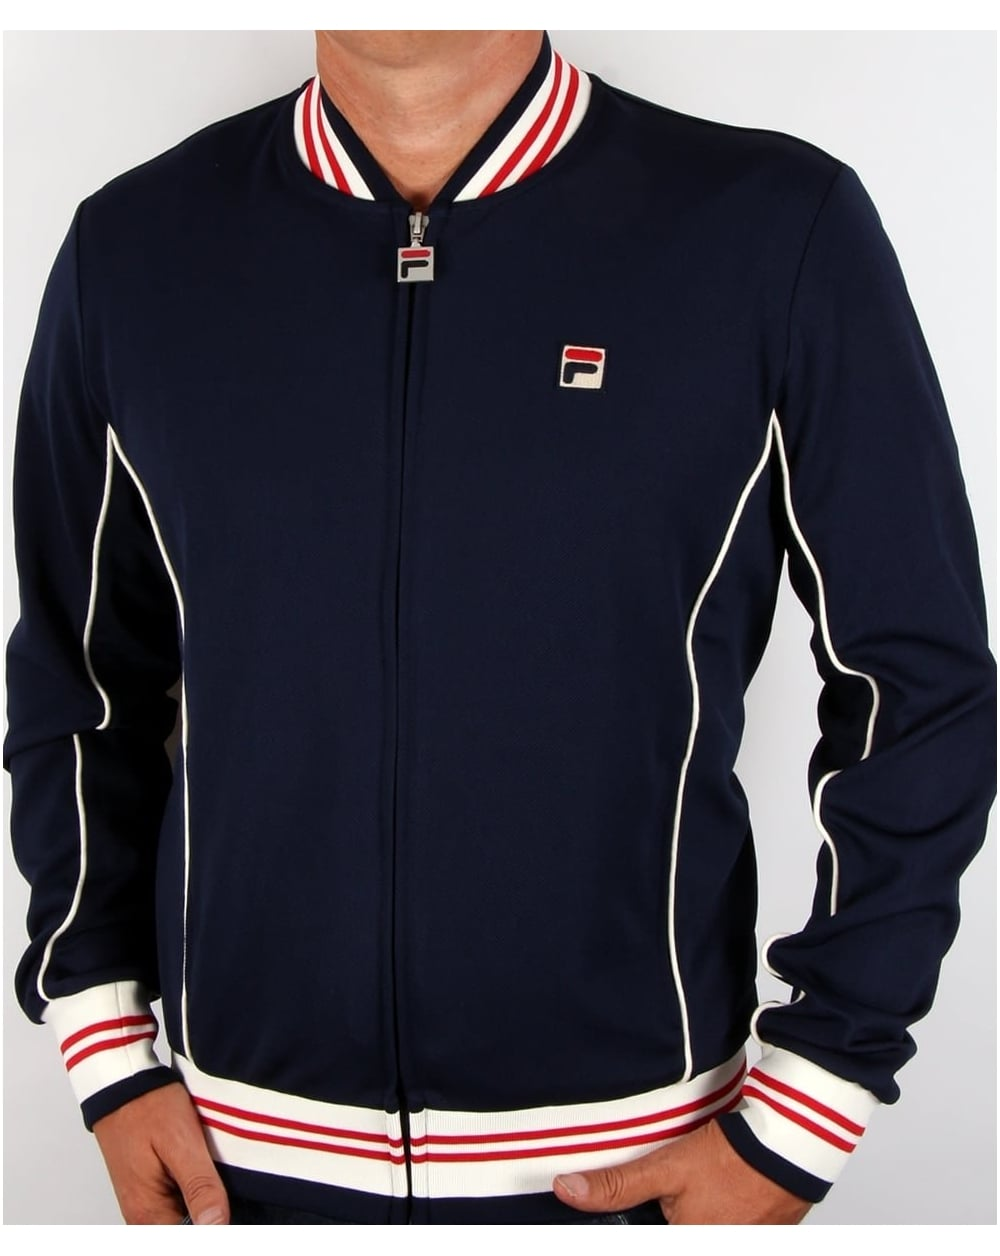 ffee24728fa Fila Vintage Baranci Track Top Navy,tracksuit,jacket,mens